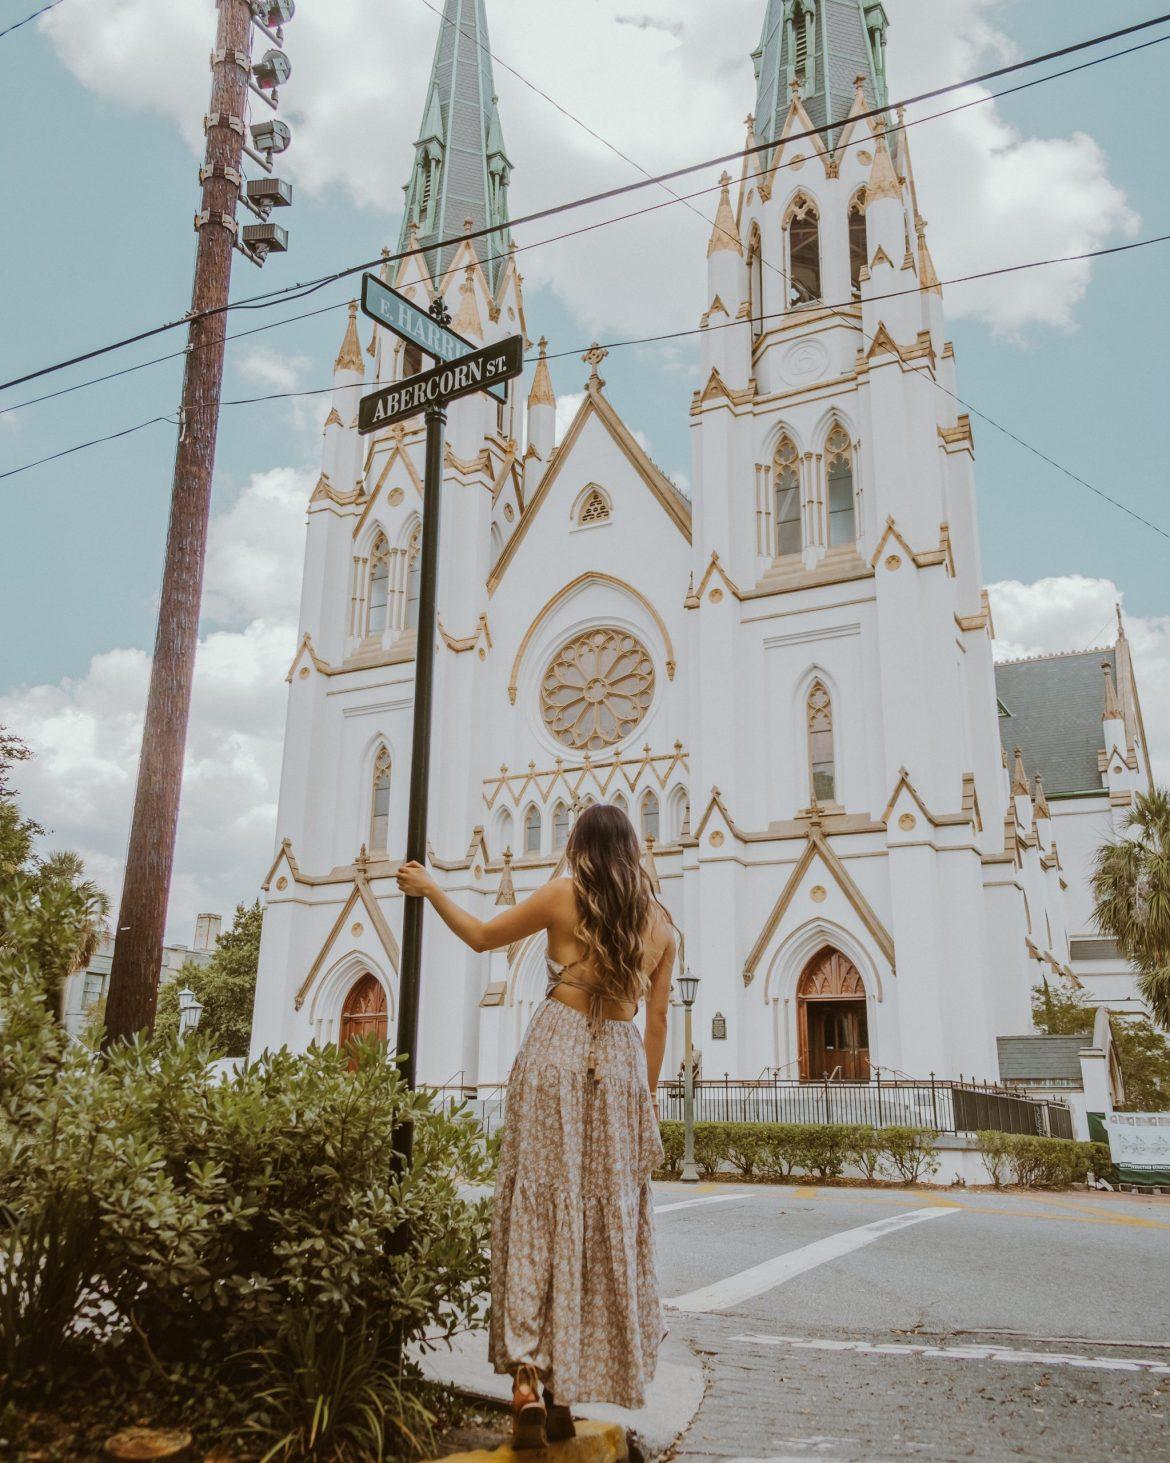 The Cathedral Basilica in Savannah, Georgia